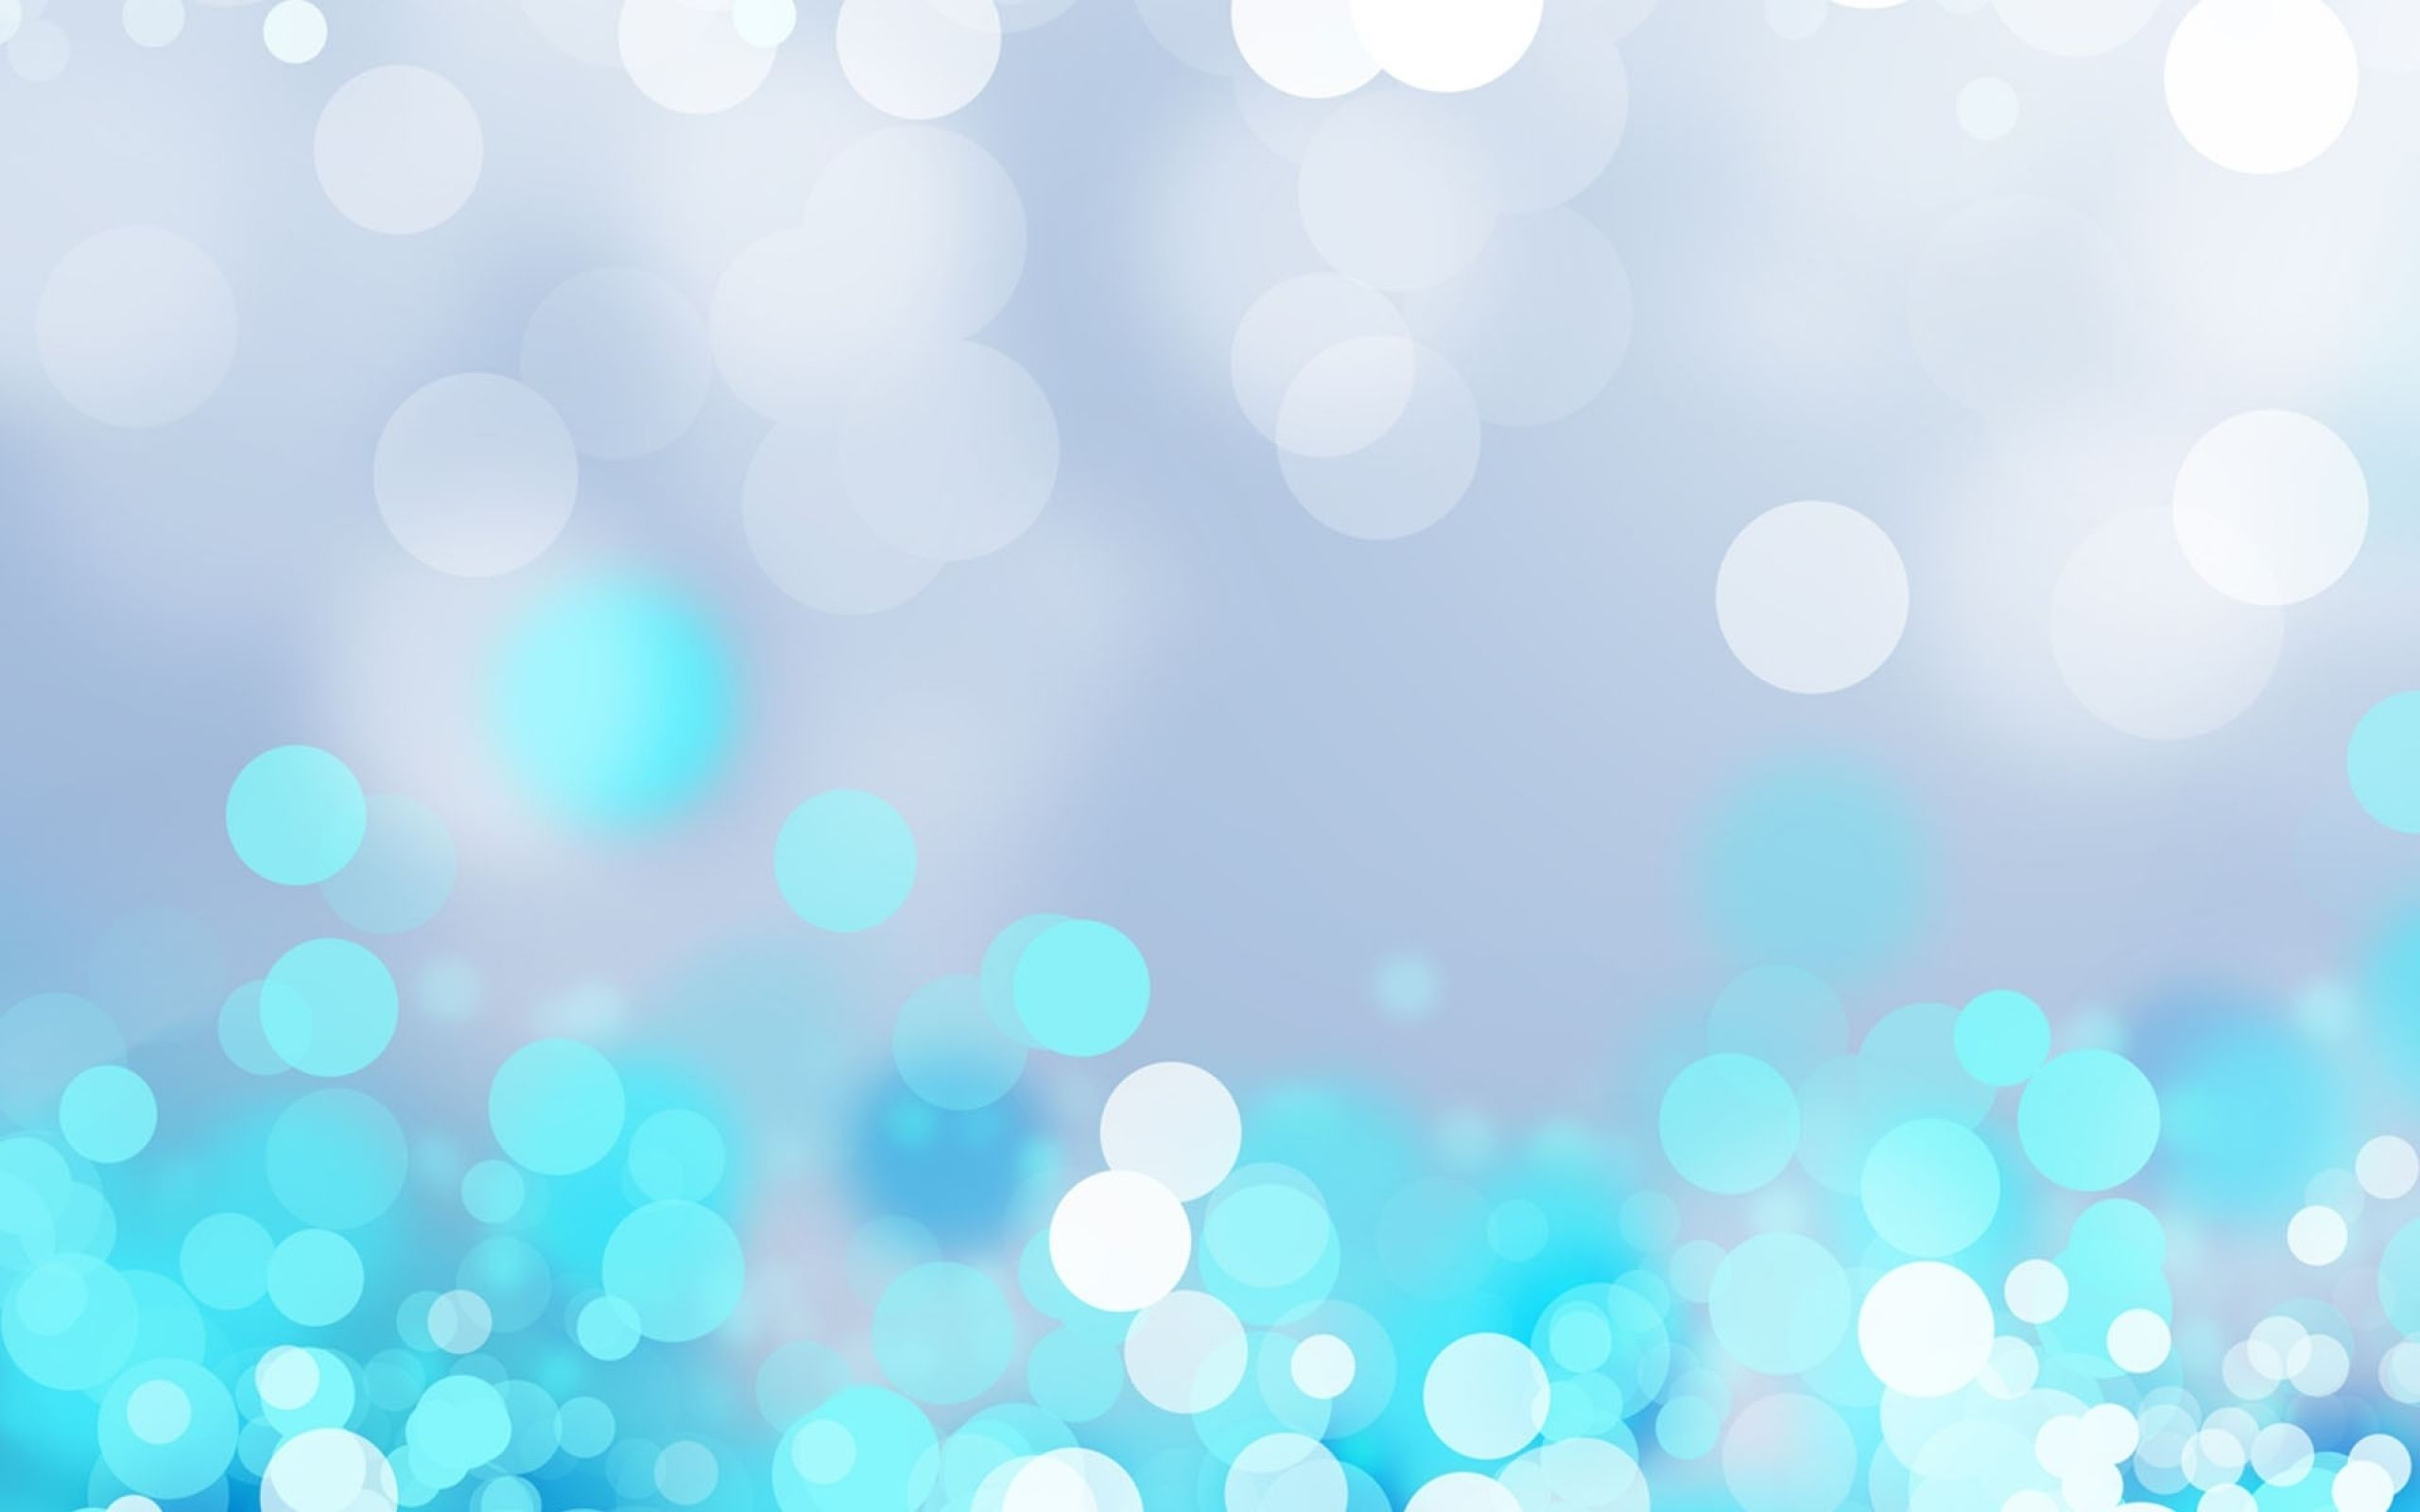 Polka Dot Polka Dot Wallpapers For All Phone Polka Dots Wallpaper Plain Wallpaper Iphone Baby Blue Wallpaper